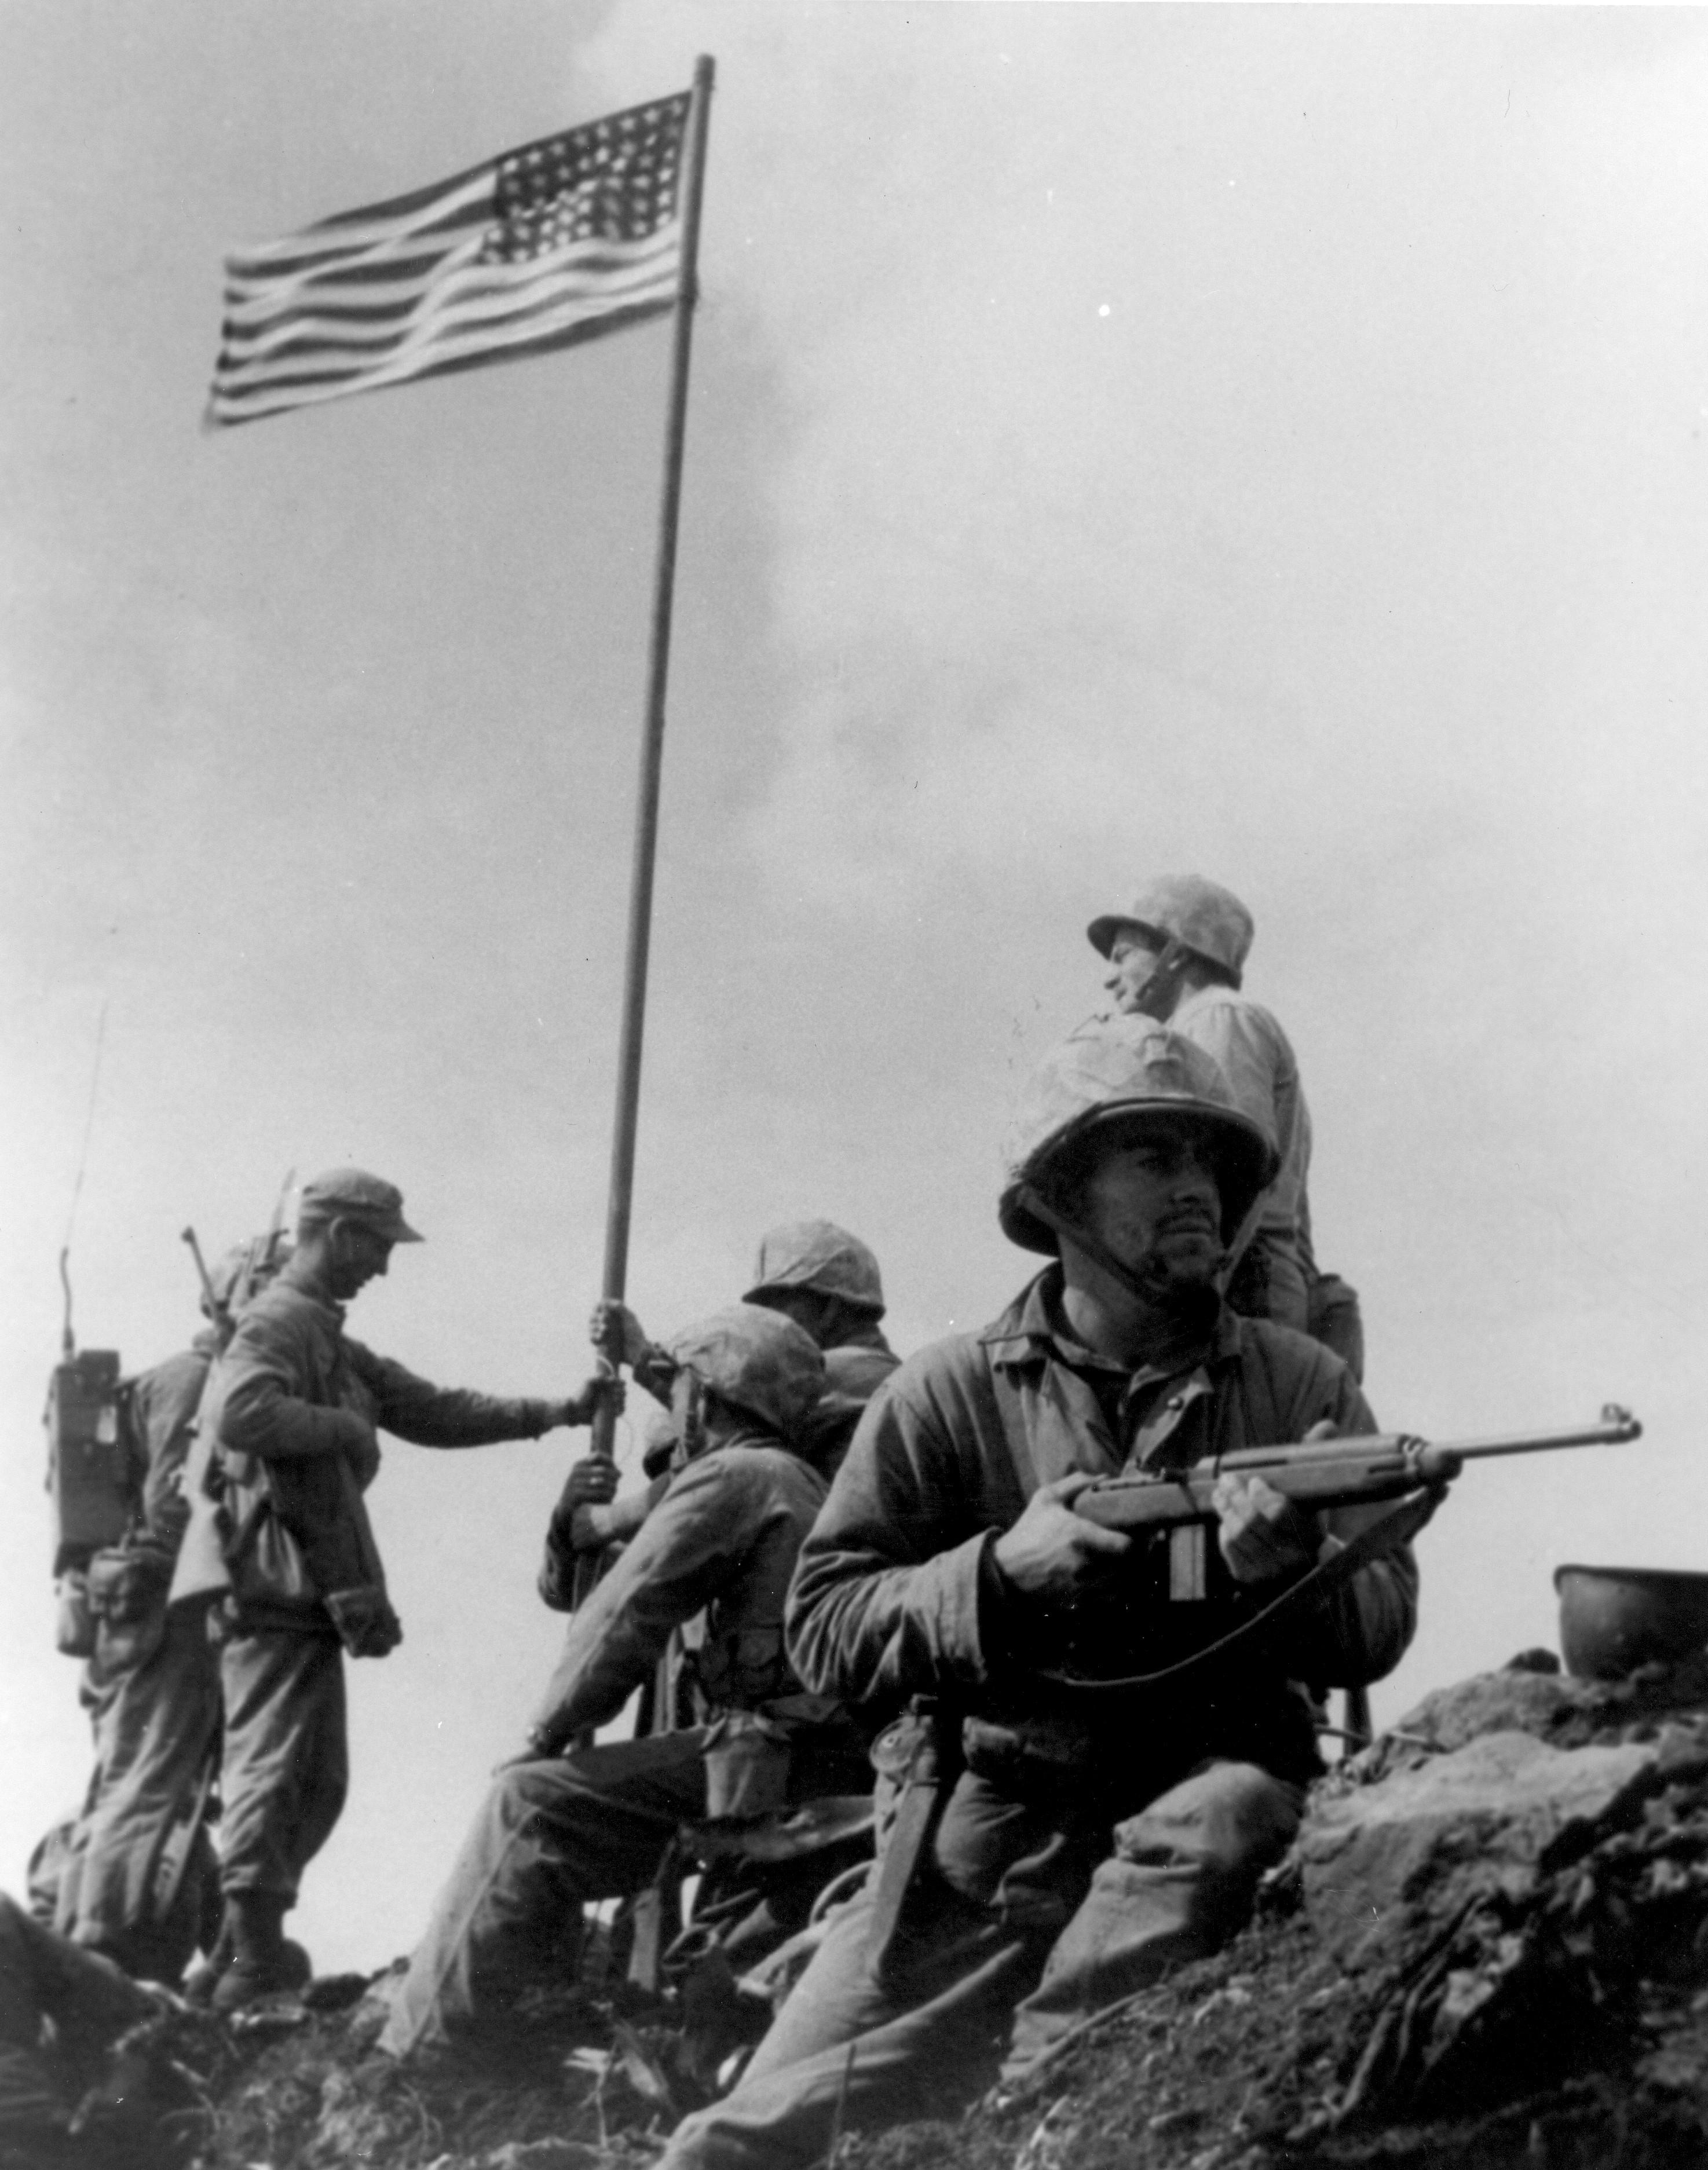 First_Iwo_Jima_Flag_Raising - Lowery